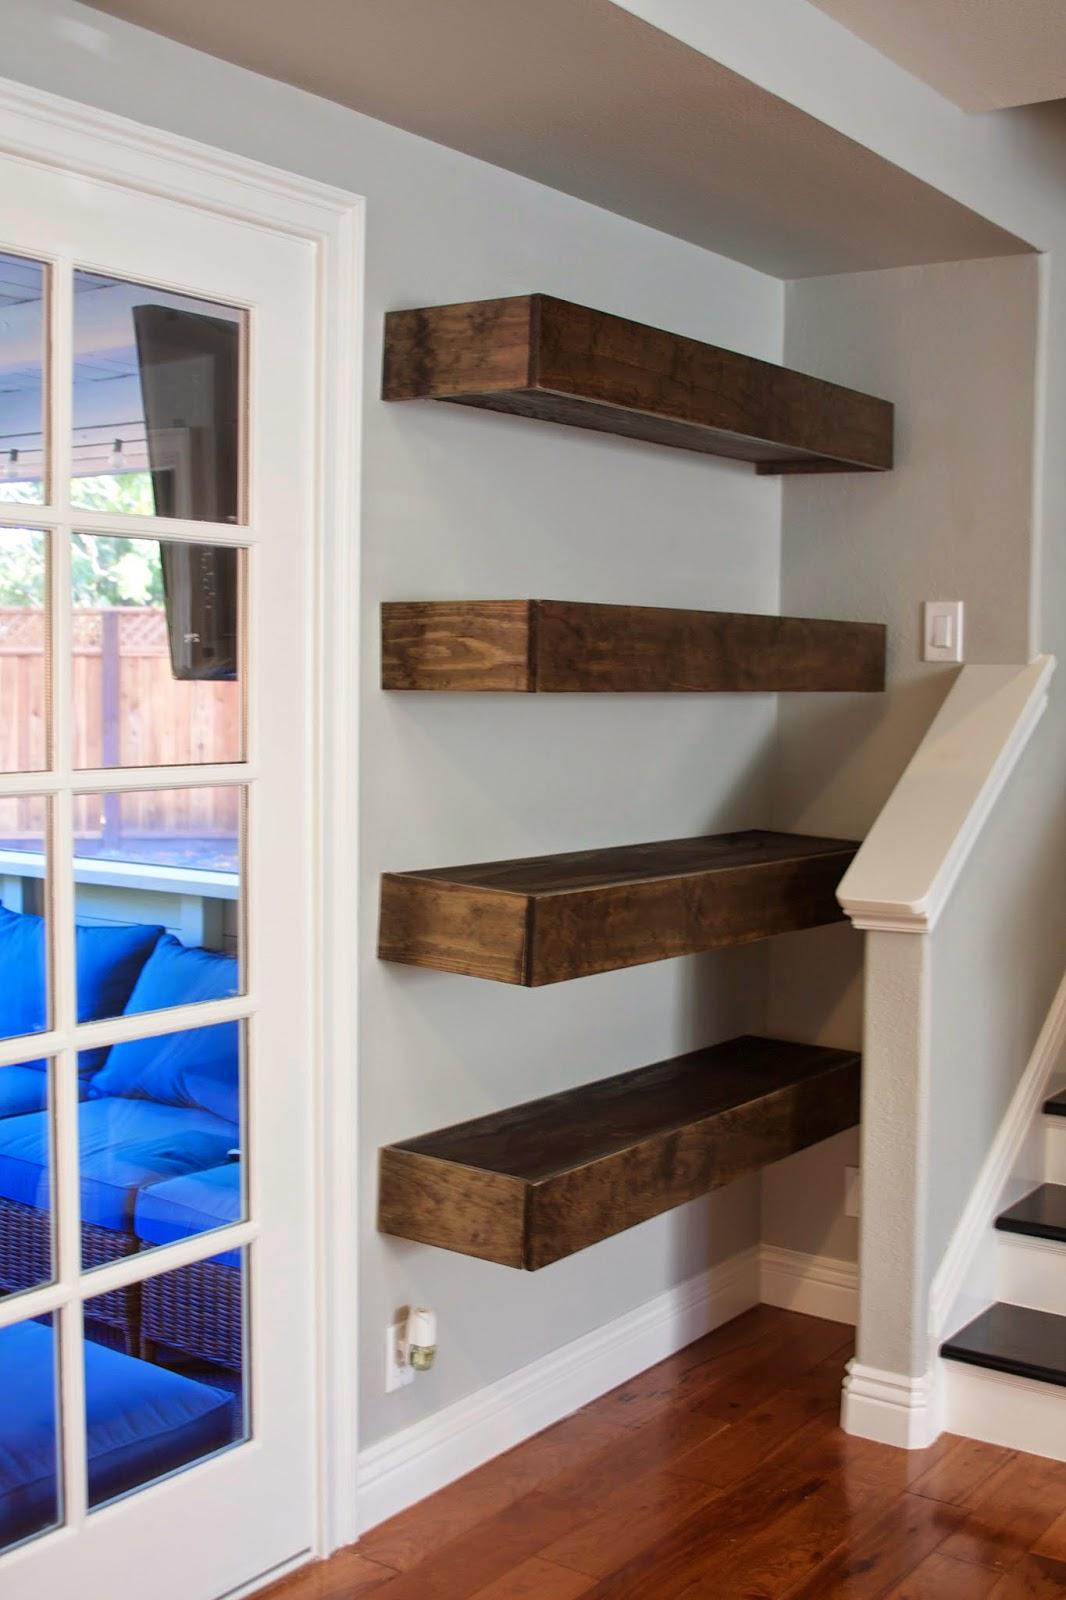 Simply Organized Simple Diy Floating Shelves Tutorial